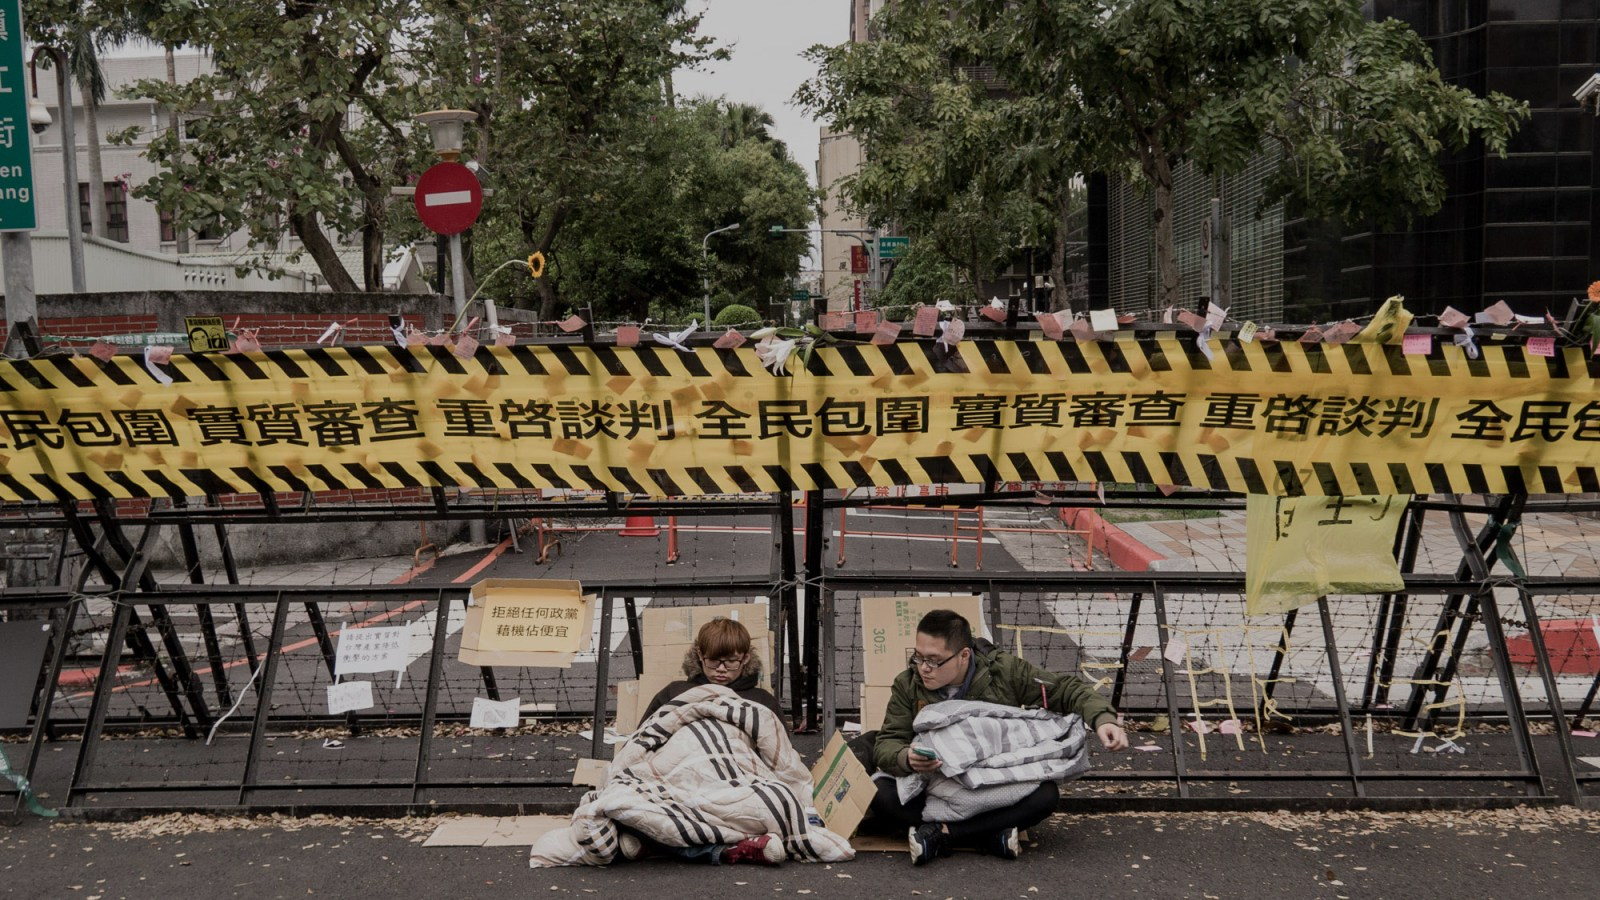 Was The Sunflower Movement An Anti-China Movement?